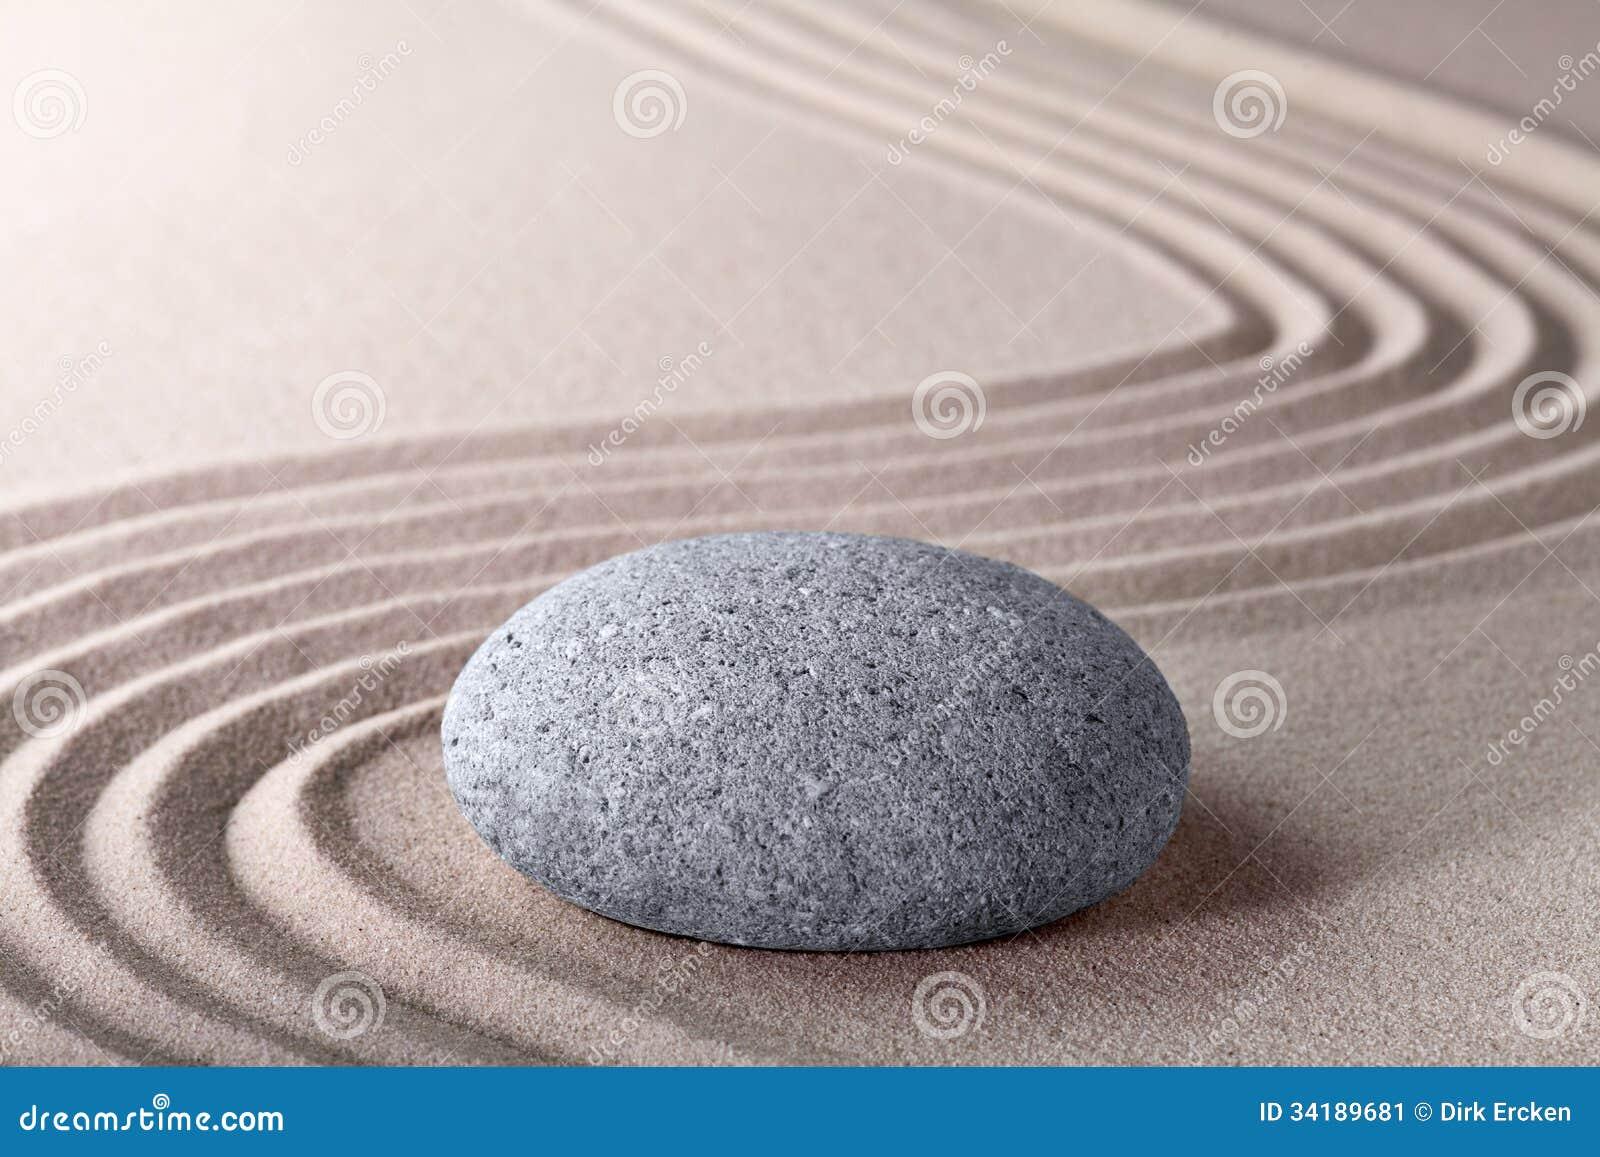 Japanese Natural Round Stones